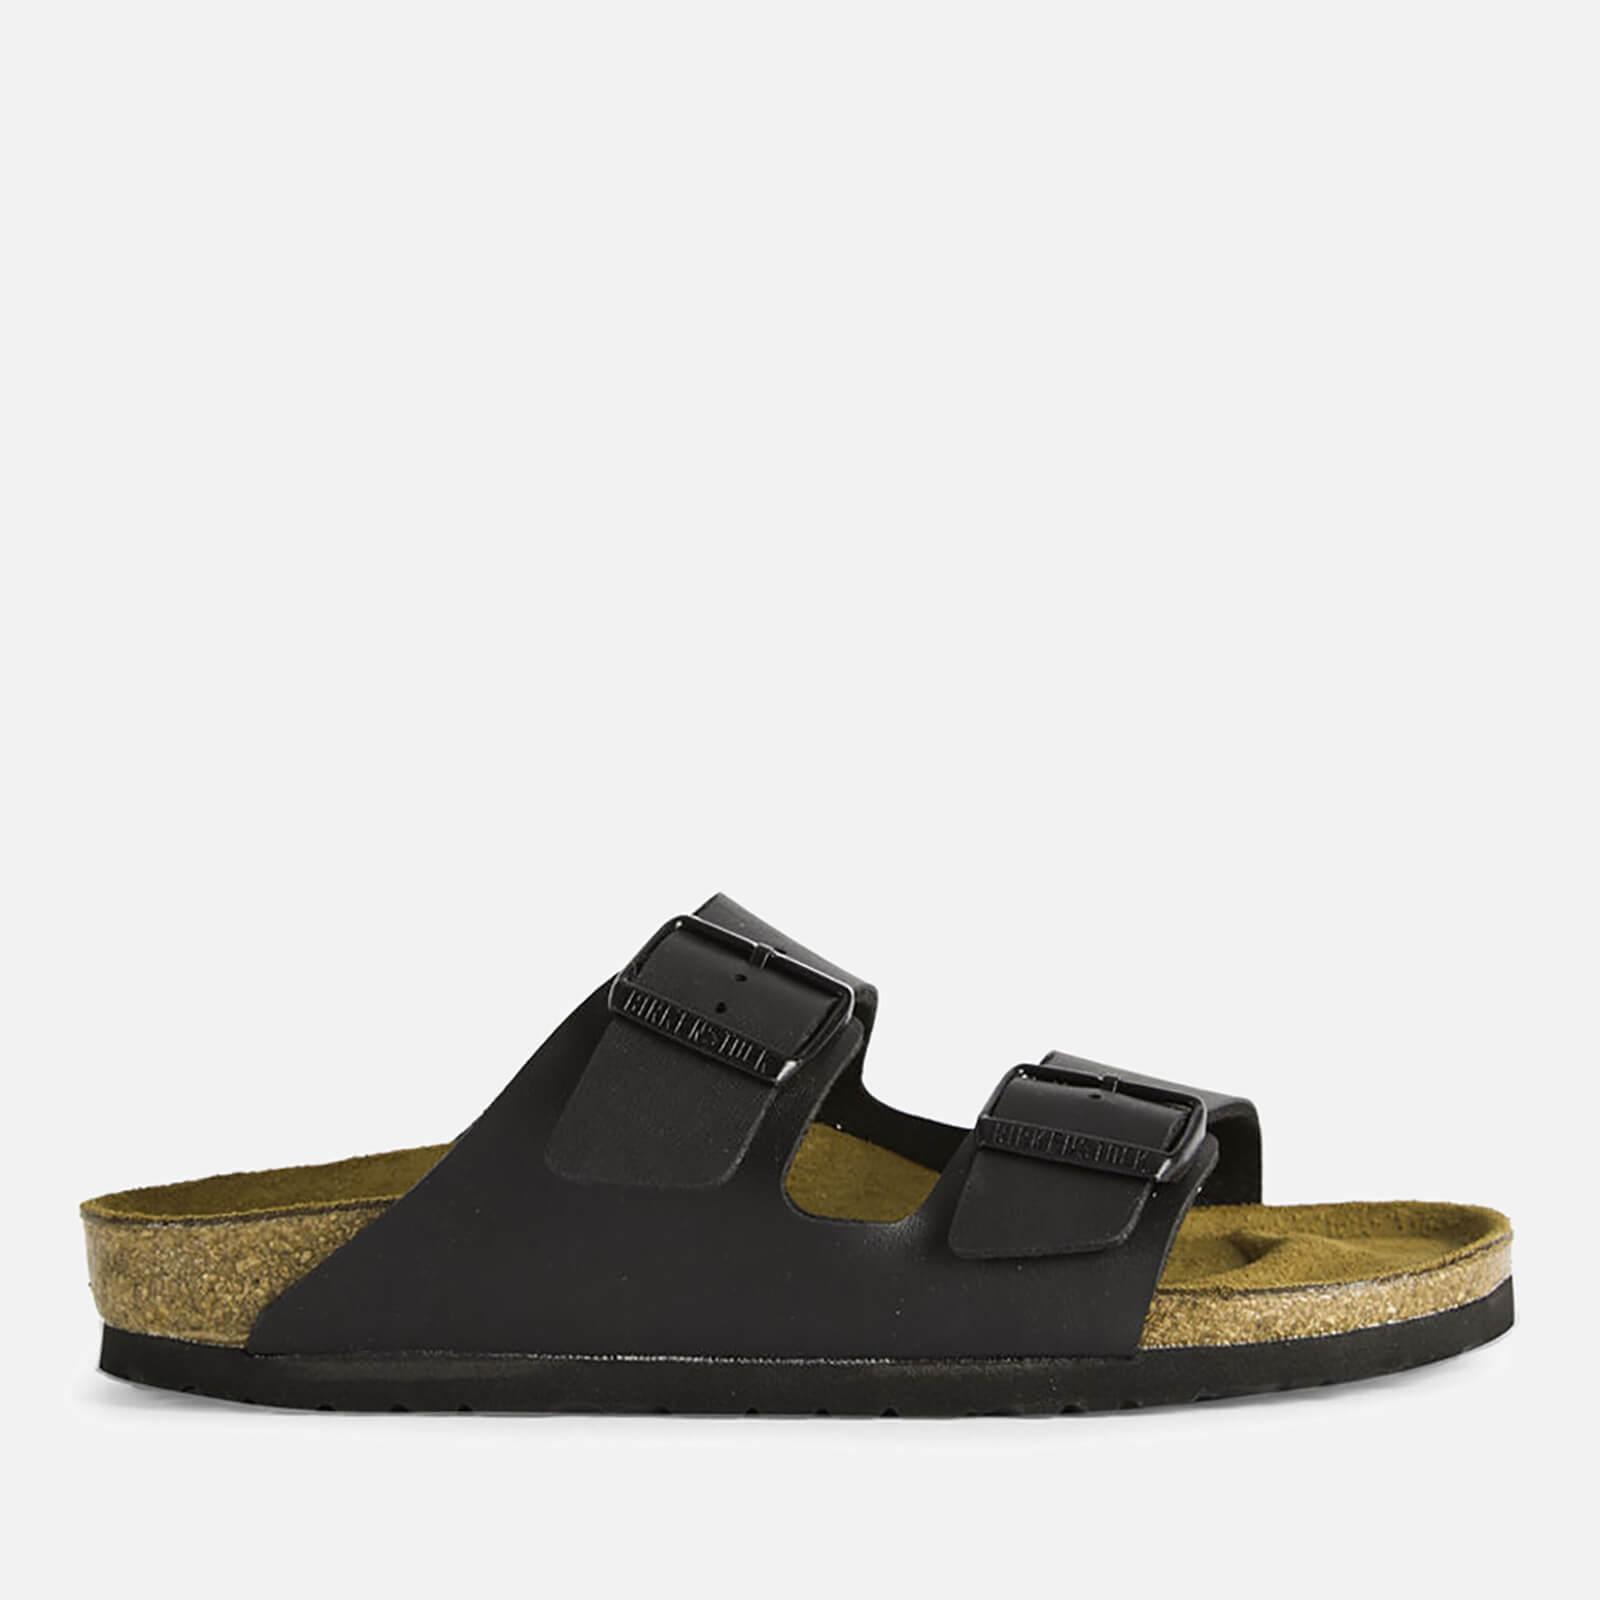 Birkenstock Women's Arizona Slim Fit Double Strap Sandals - Black - EU 40/UK 7